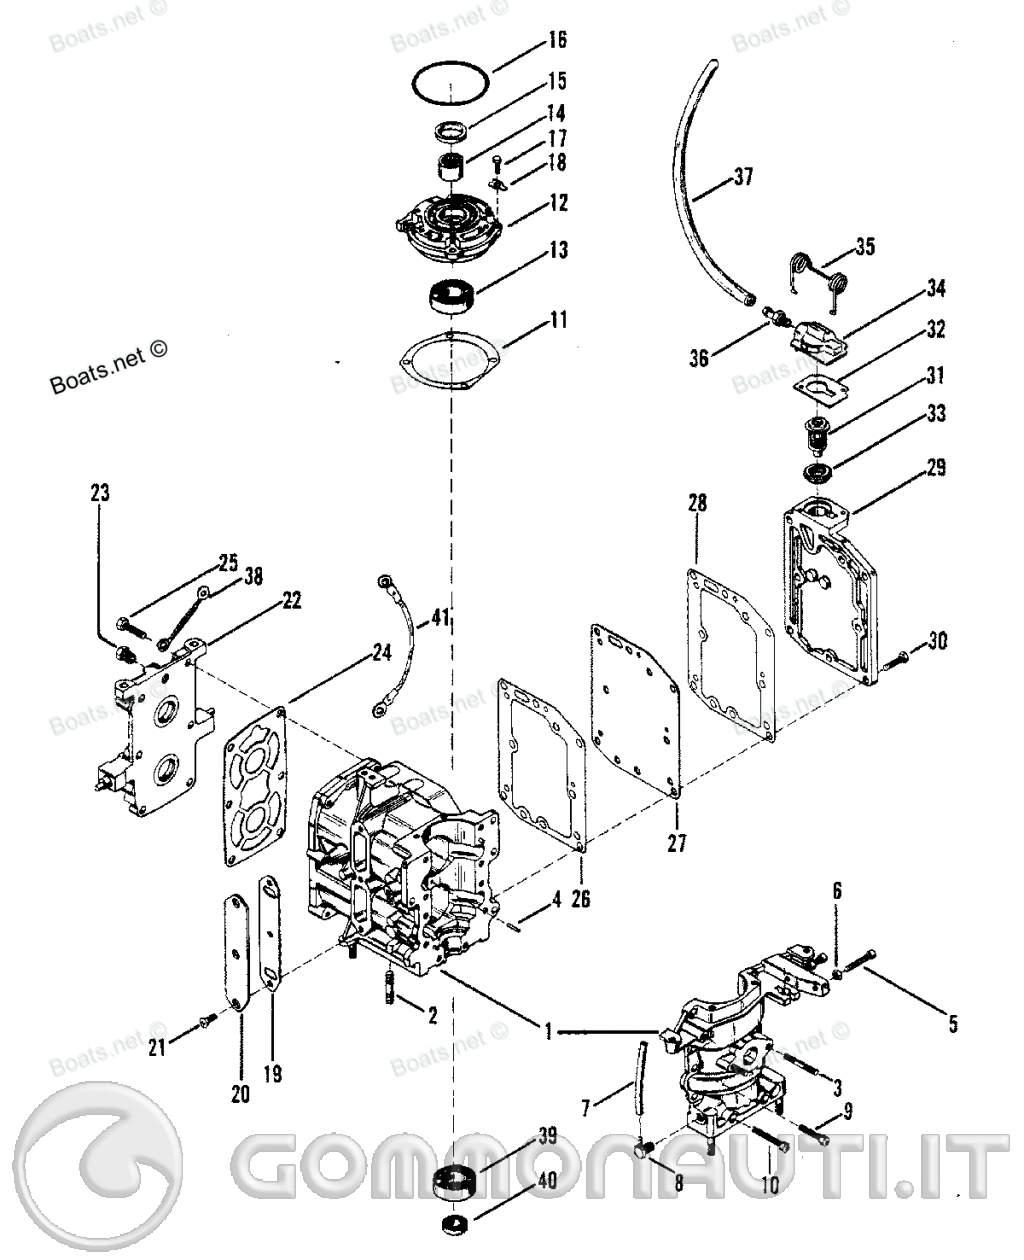 10 hp honda outboard parts diagram  honda  auto wiring diagram